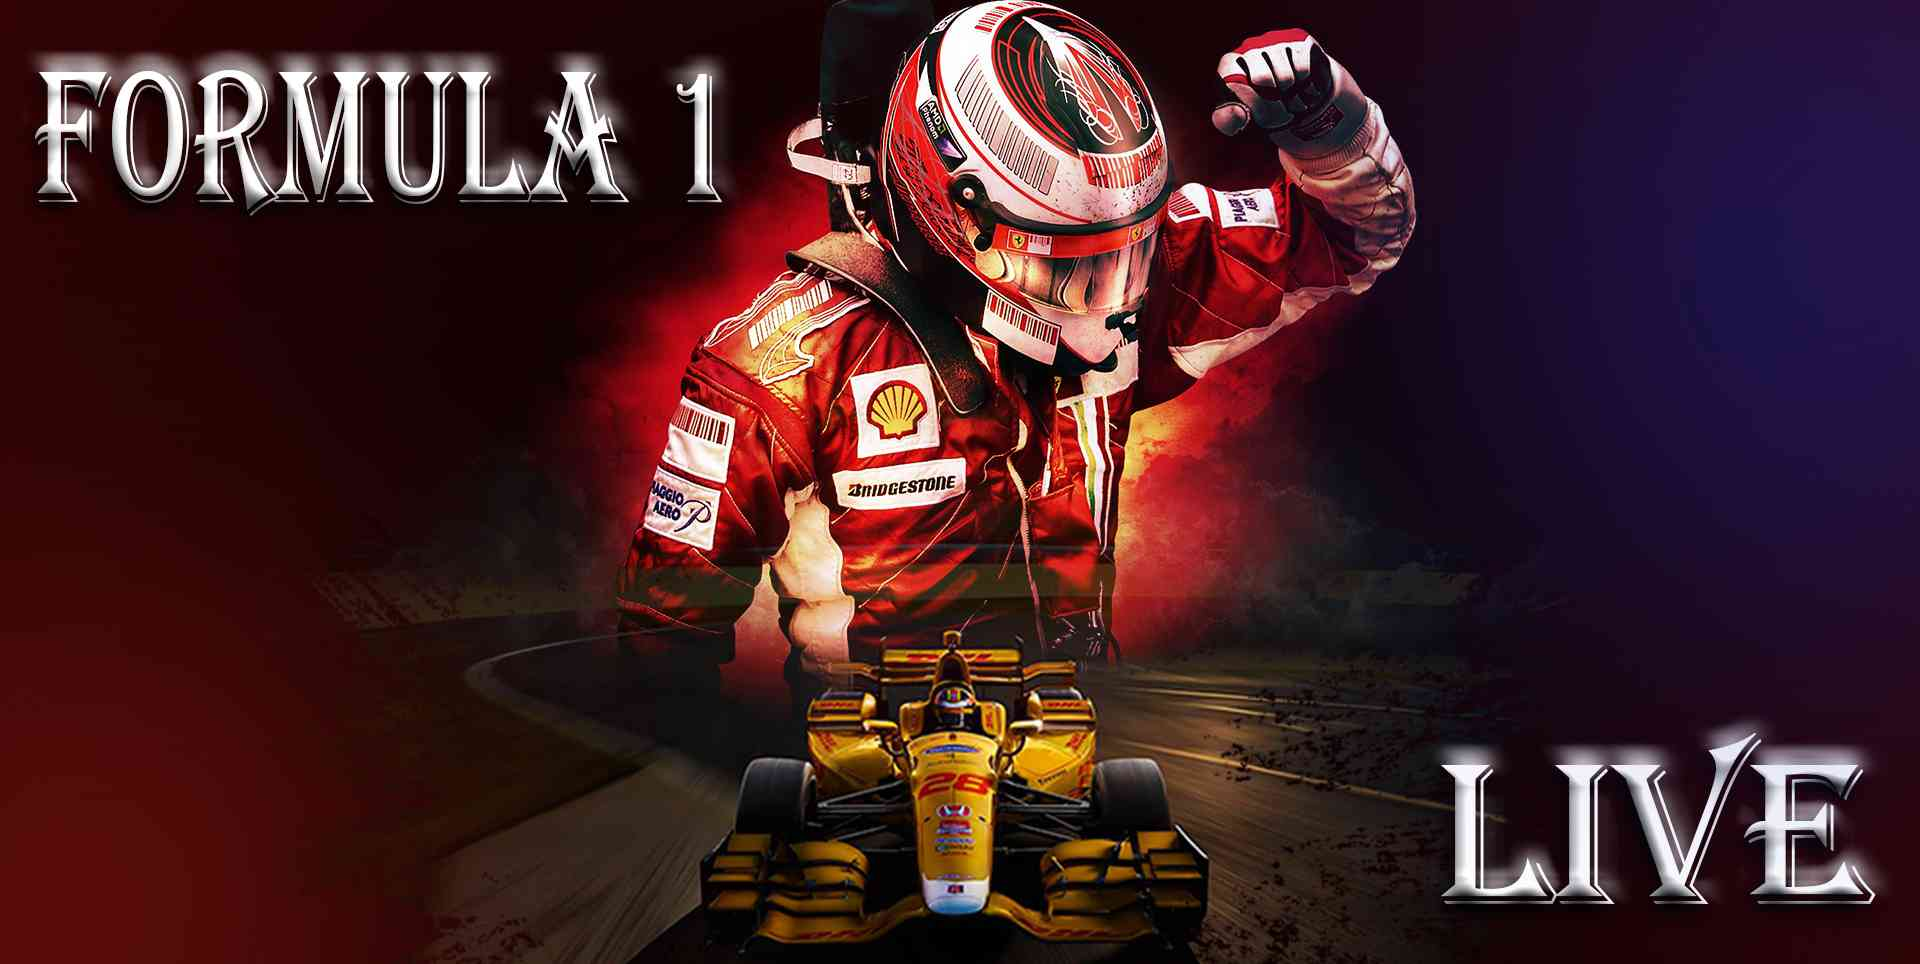 Live 2014 Formula 1 Australian Grand Prix Online